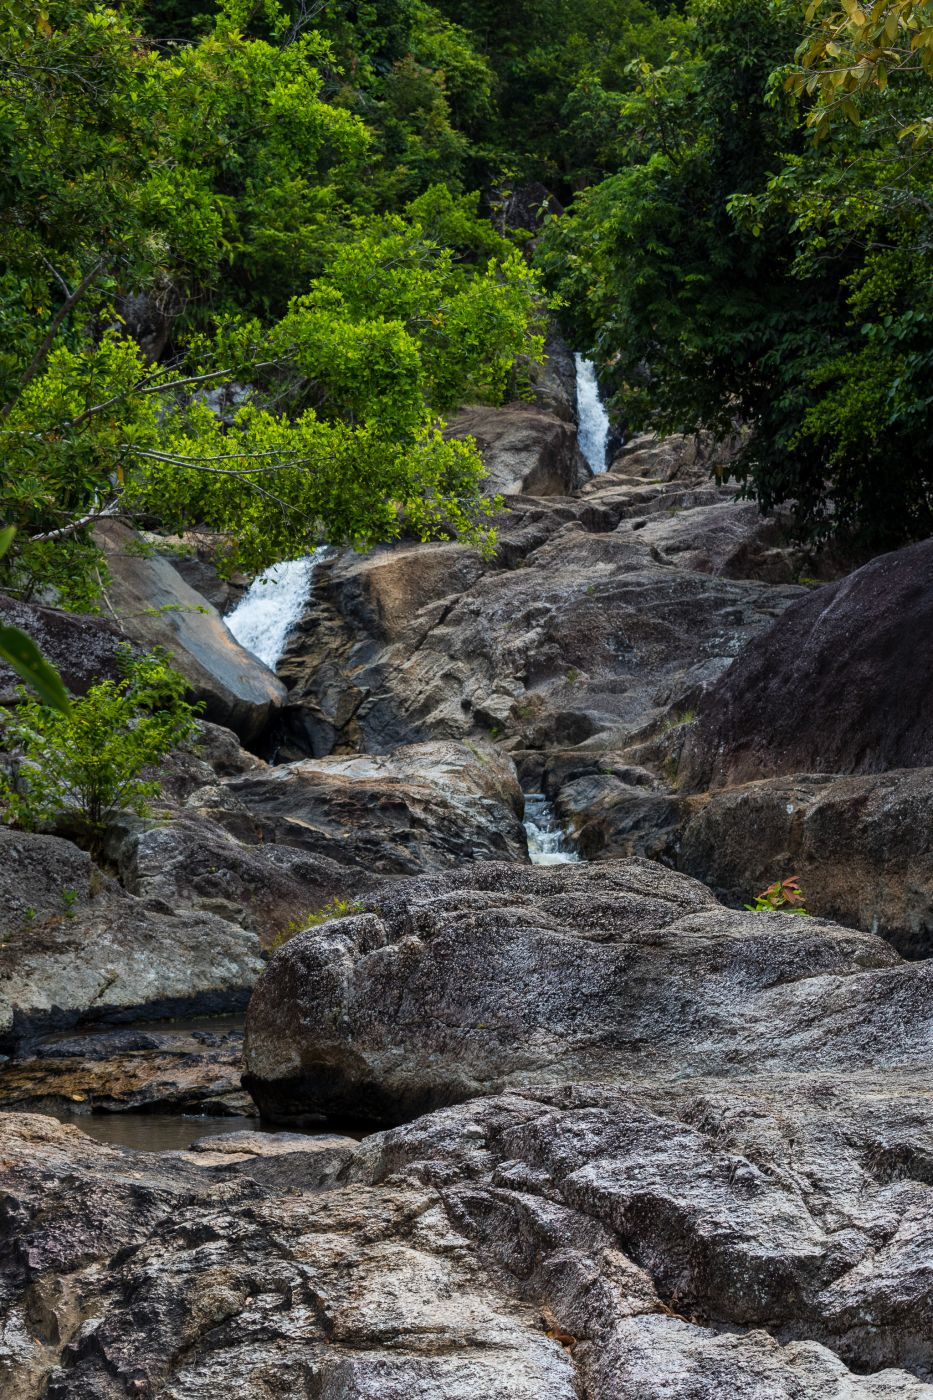 Than Sadet Waterfalls (upper part), Thailand